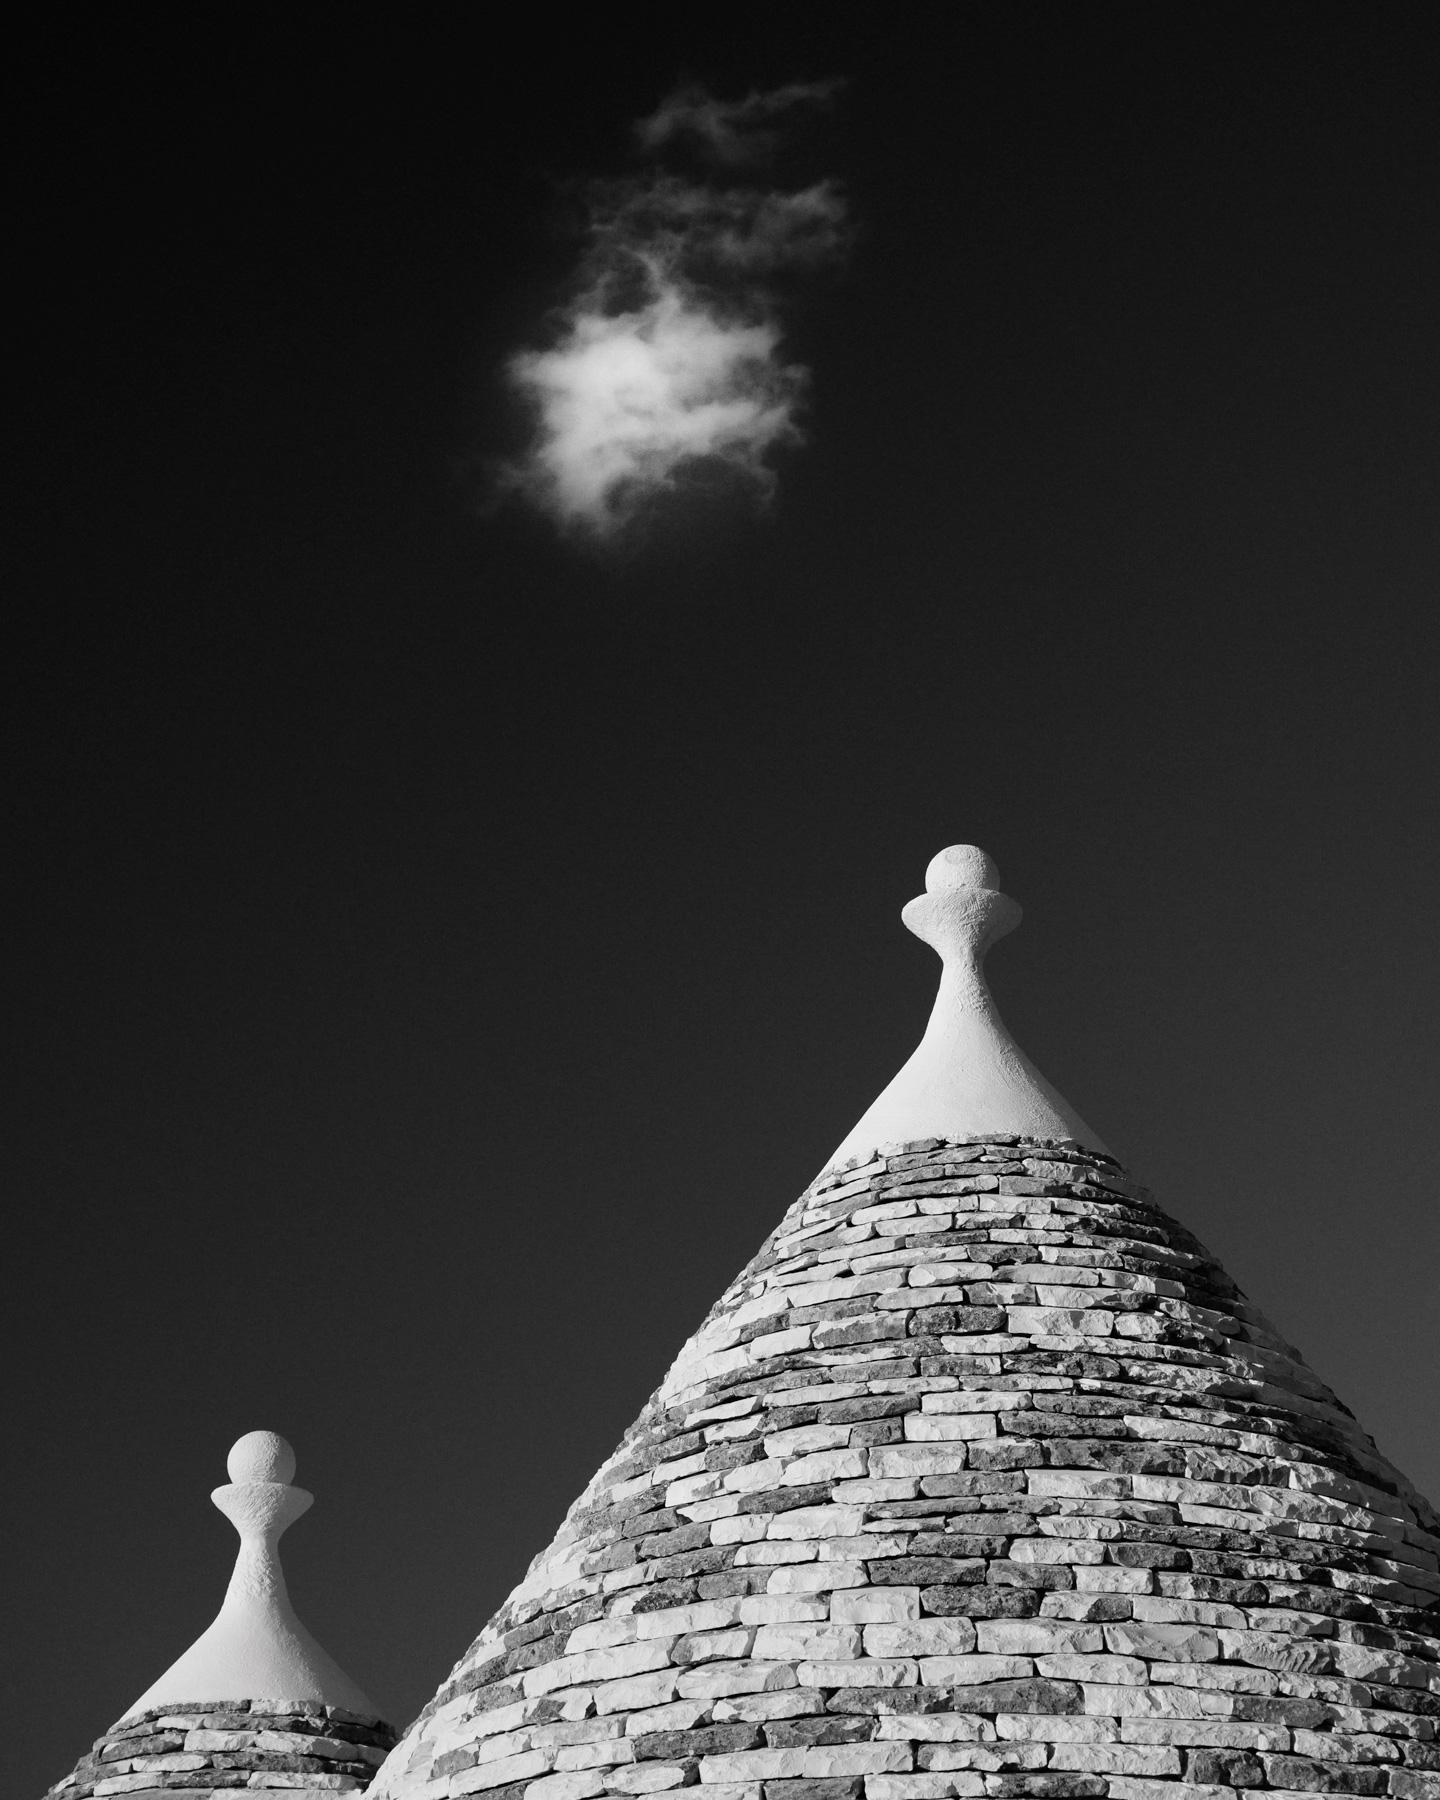 Trulli Rooftop Cones